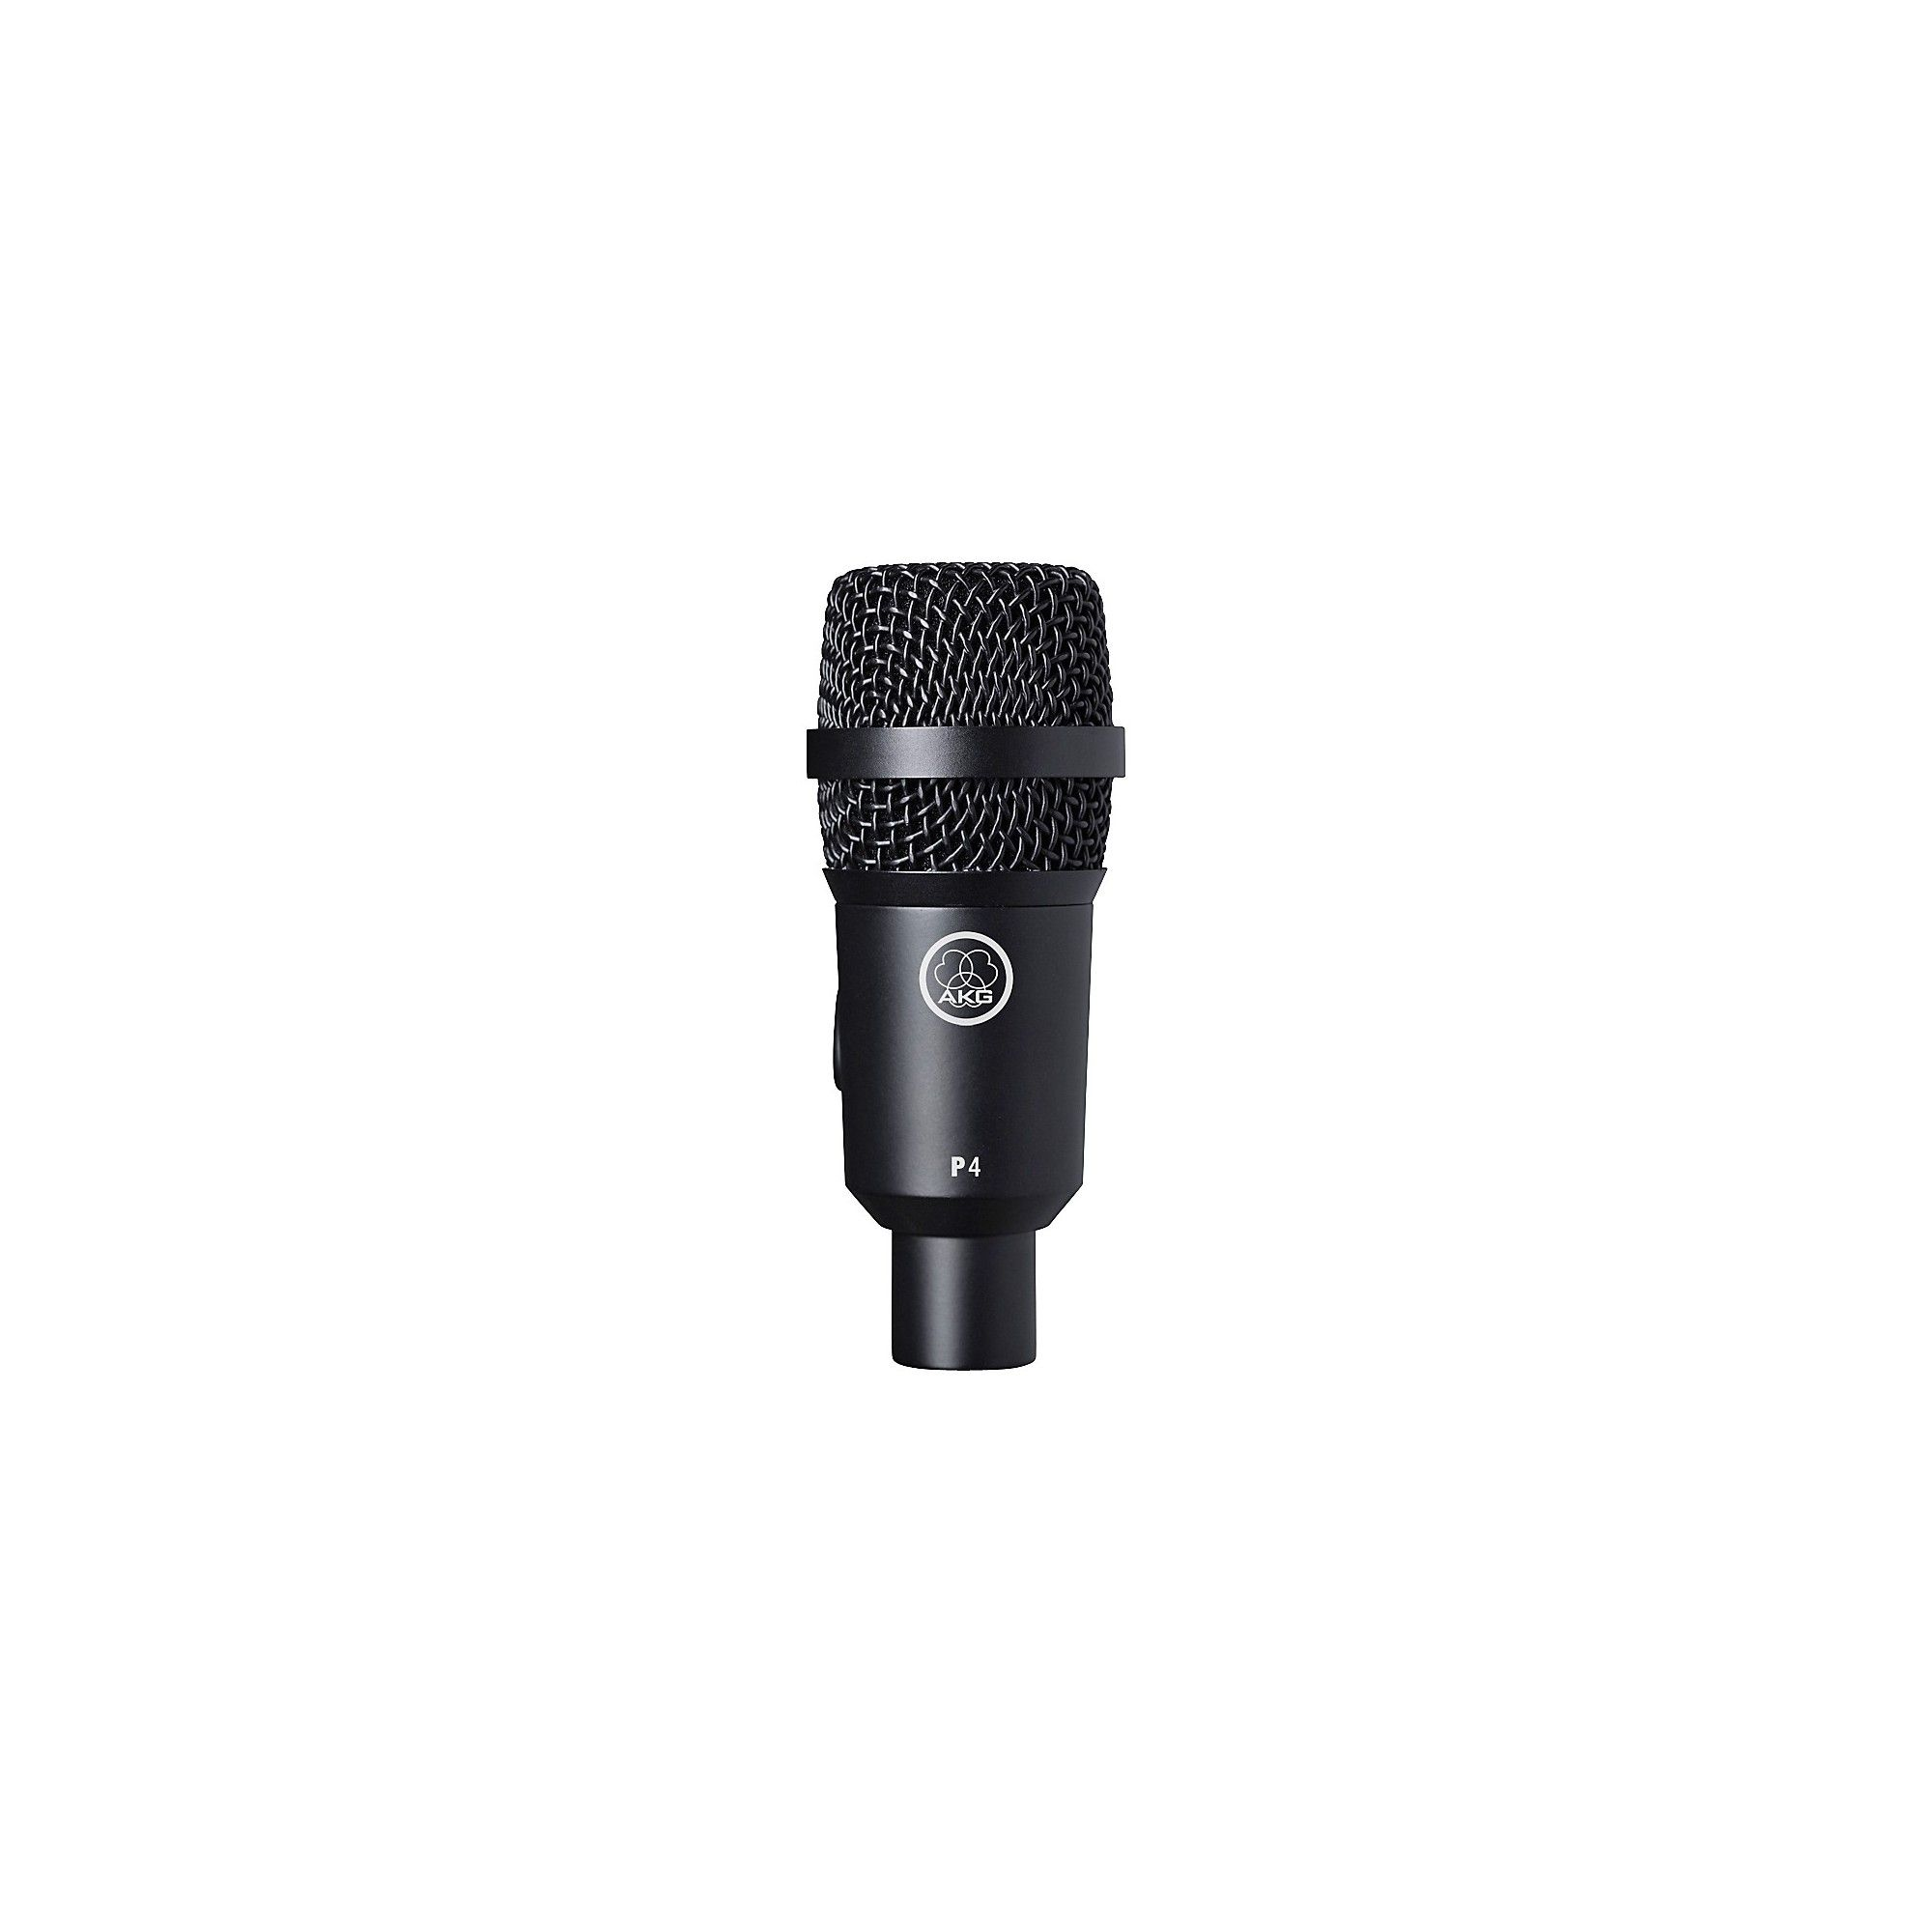 AKG P4 Microphone